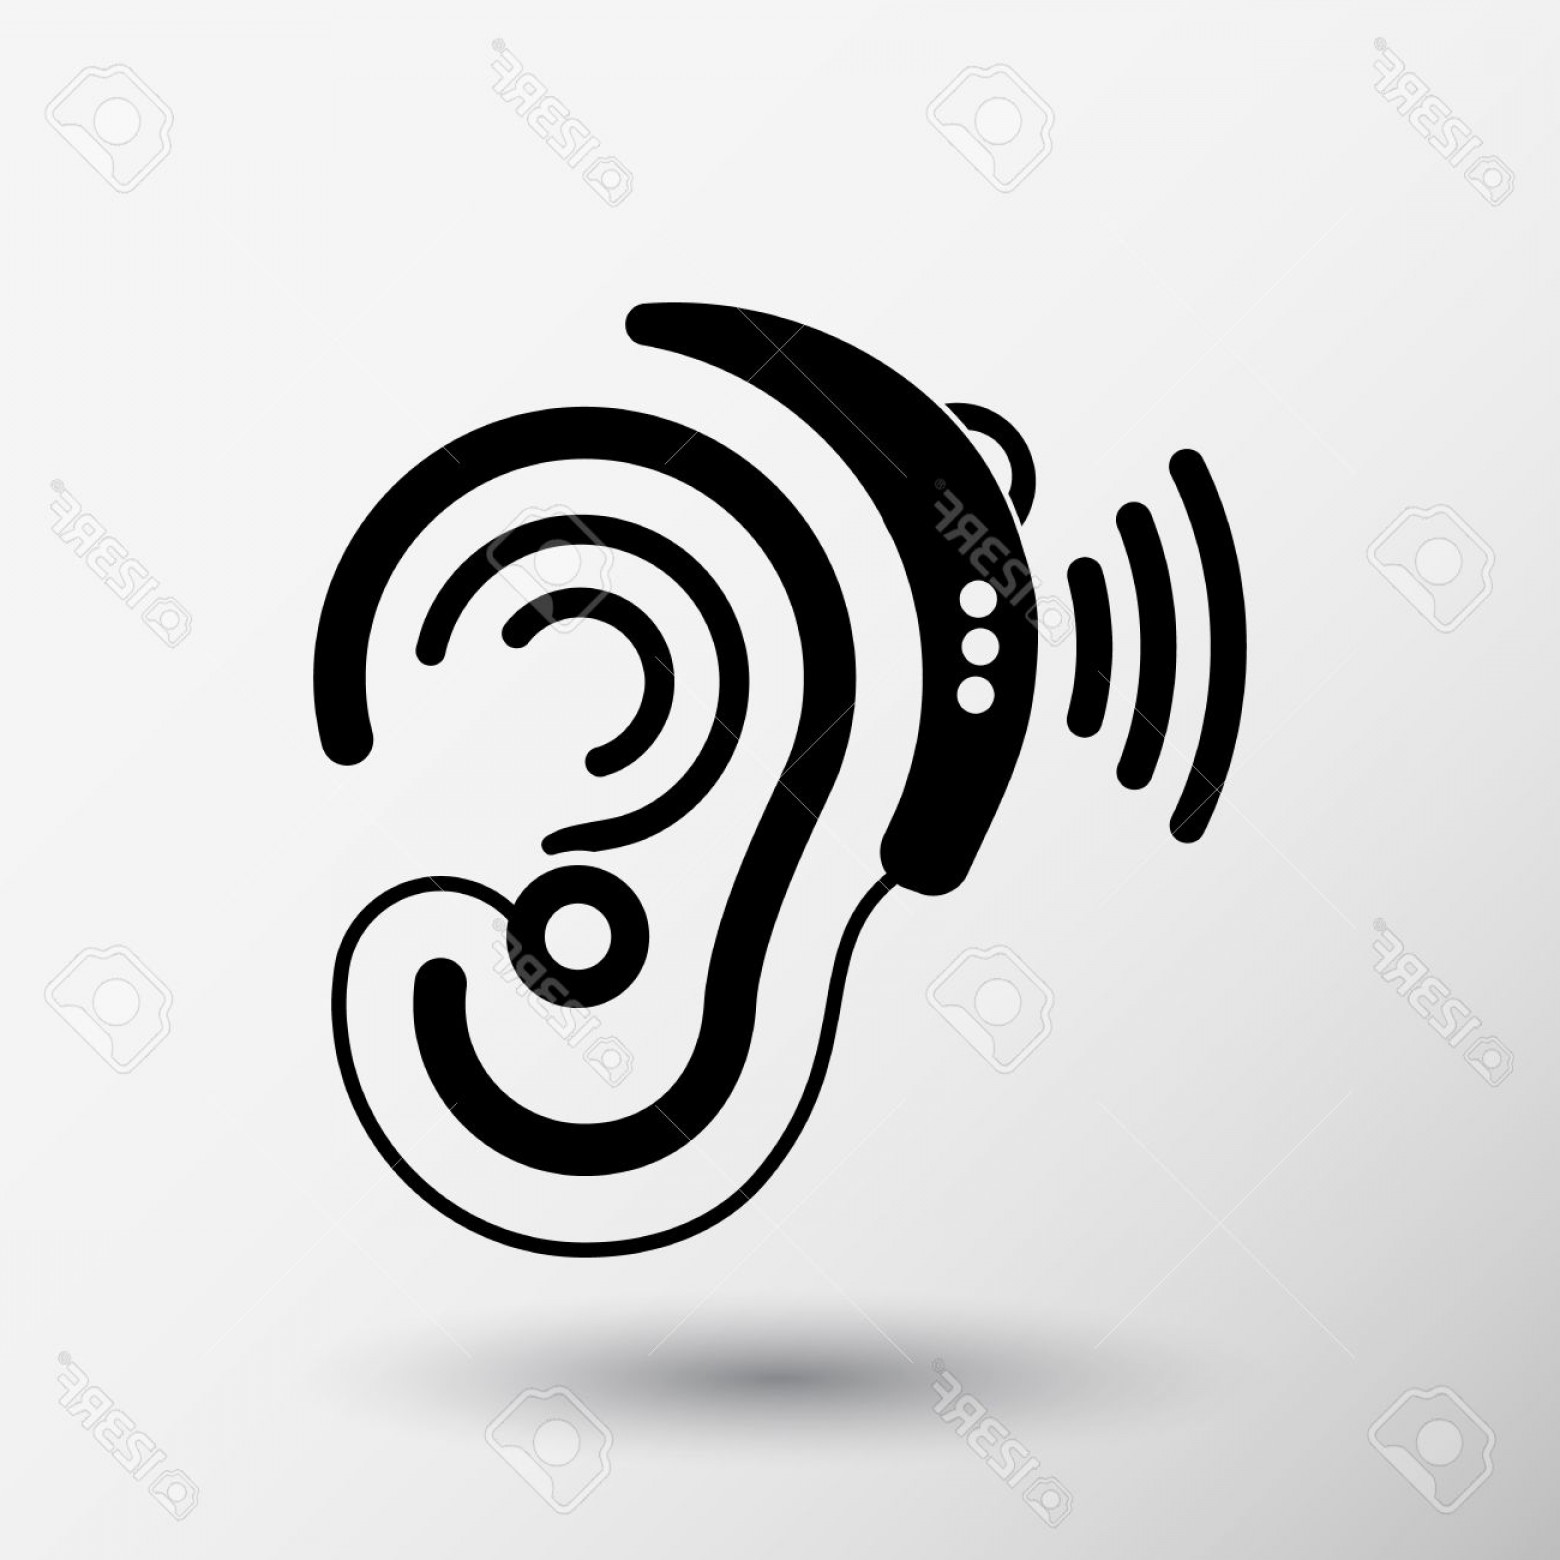 1560x1560 Photostock Vector Ear Vector Icon Hearing Aid Ear Listen Sound